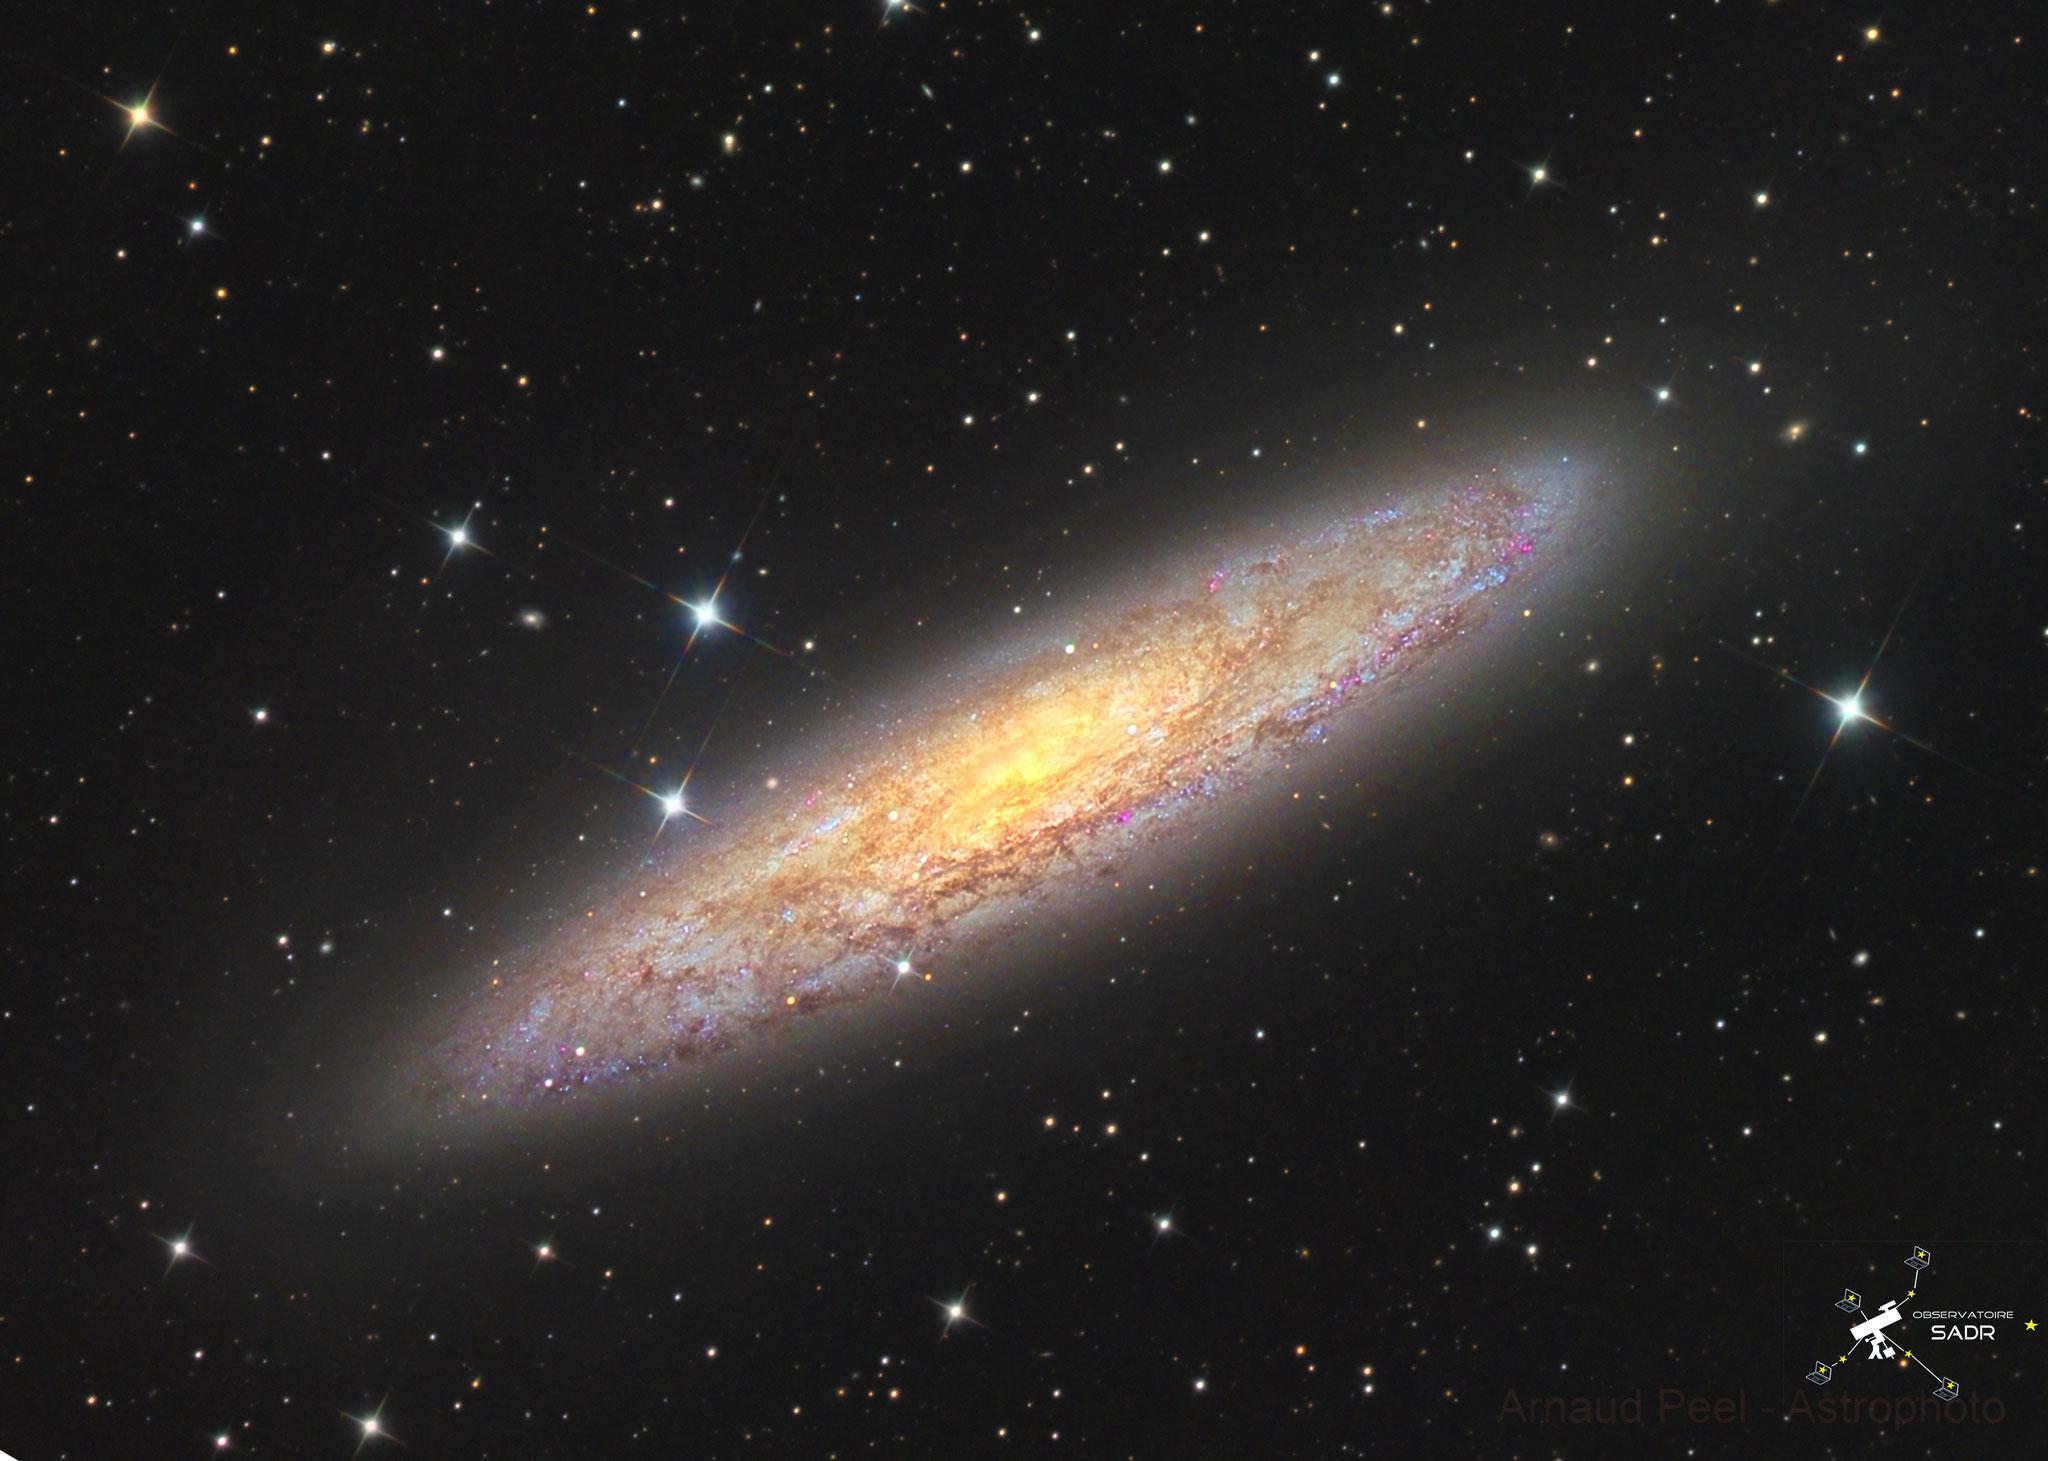 NGC253, la galaxie du Sculpteur, L(25x600), RVB (10x120 chaque), T355 mm, Sadr Chili, Arnaud